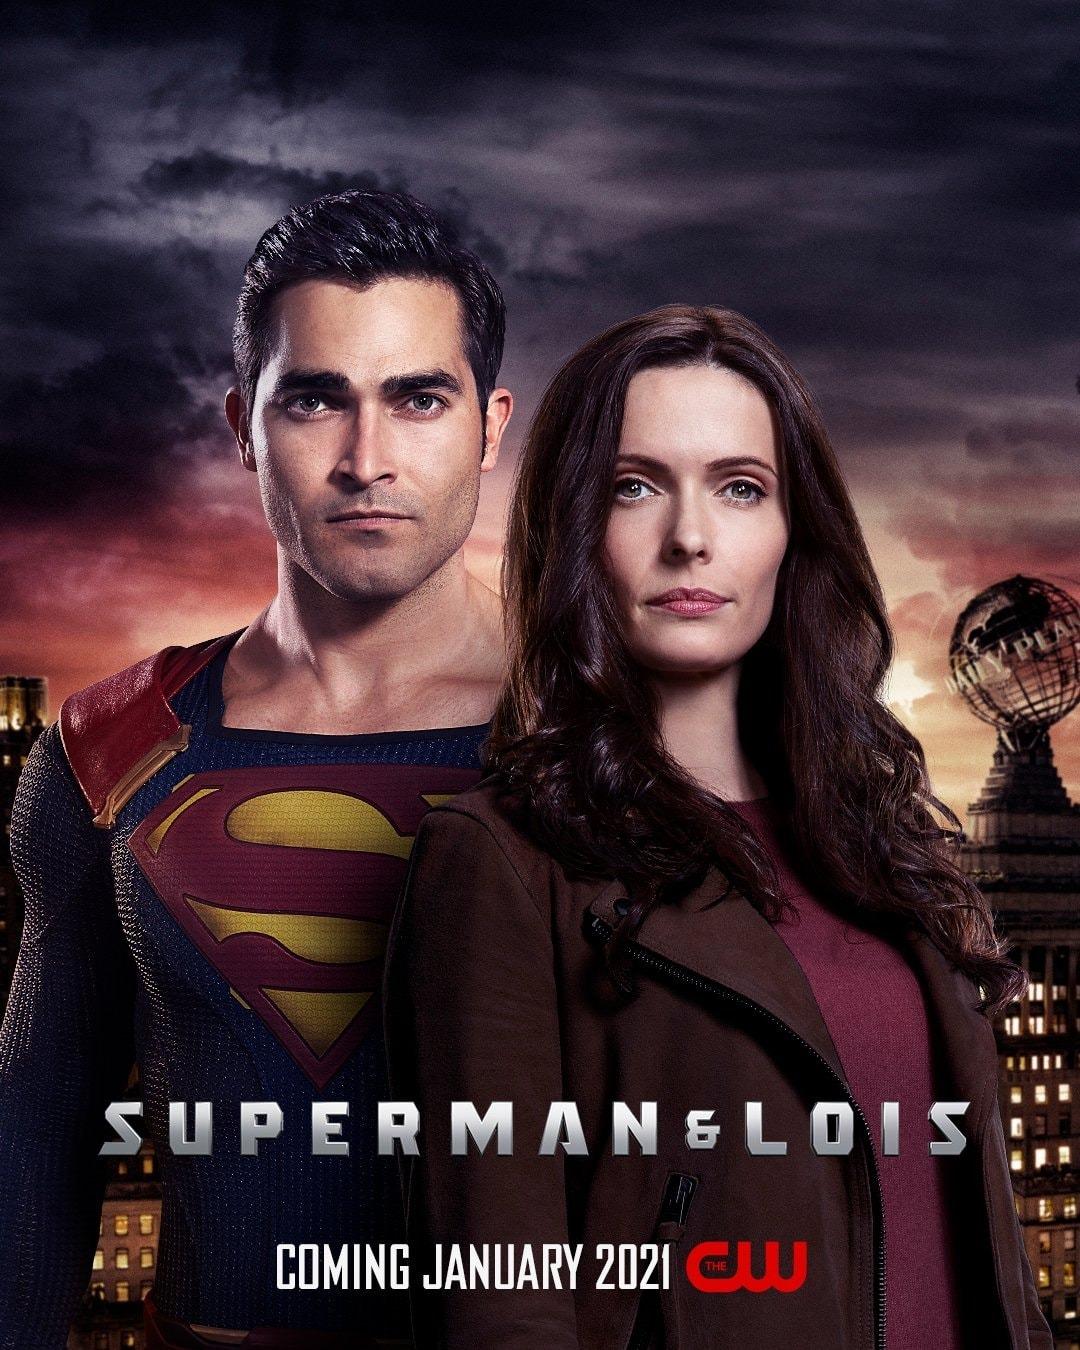 Superman (Tyler Hoechlin) y Lois Lane (Elizabeth Tullock) en un póster de Superman & Lois. Imagen: impawards.com